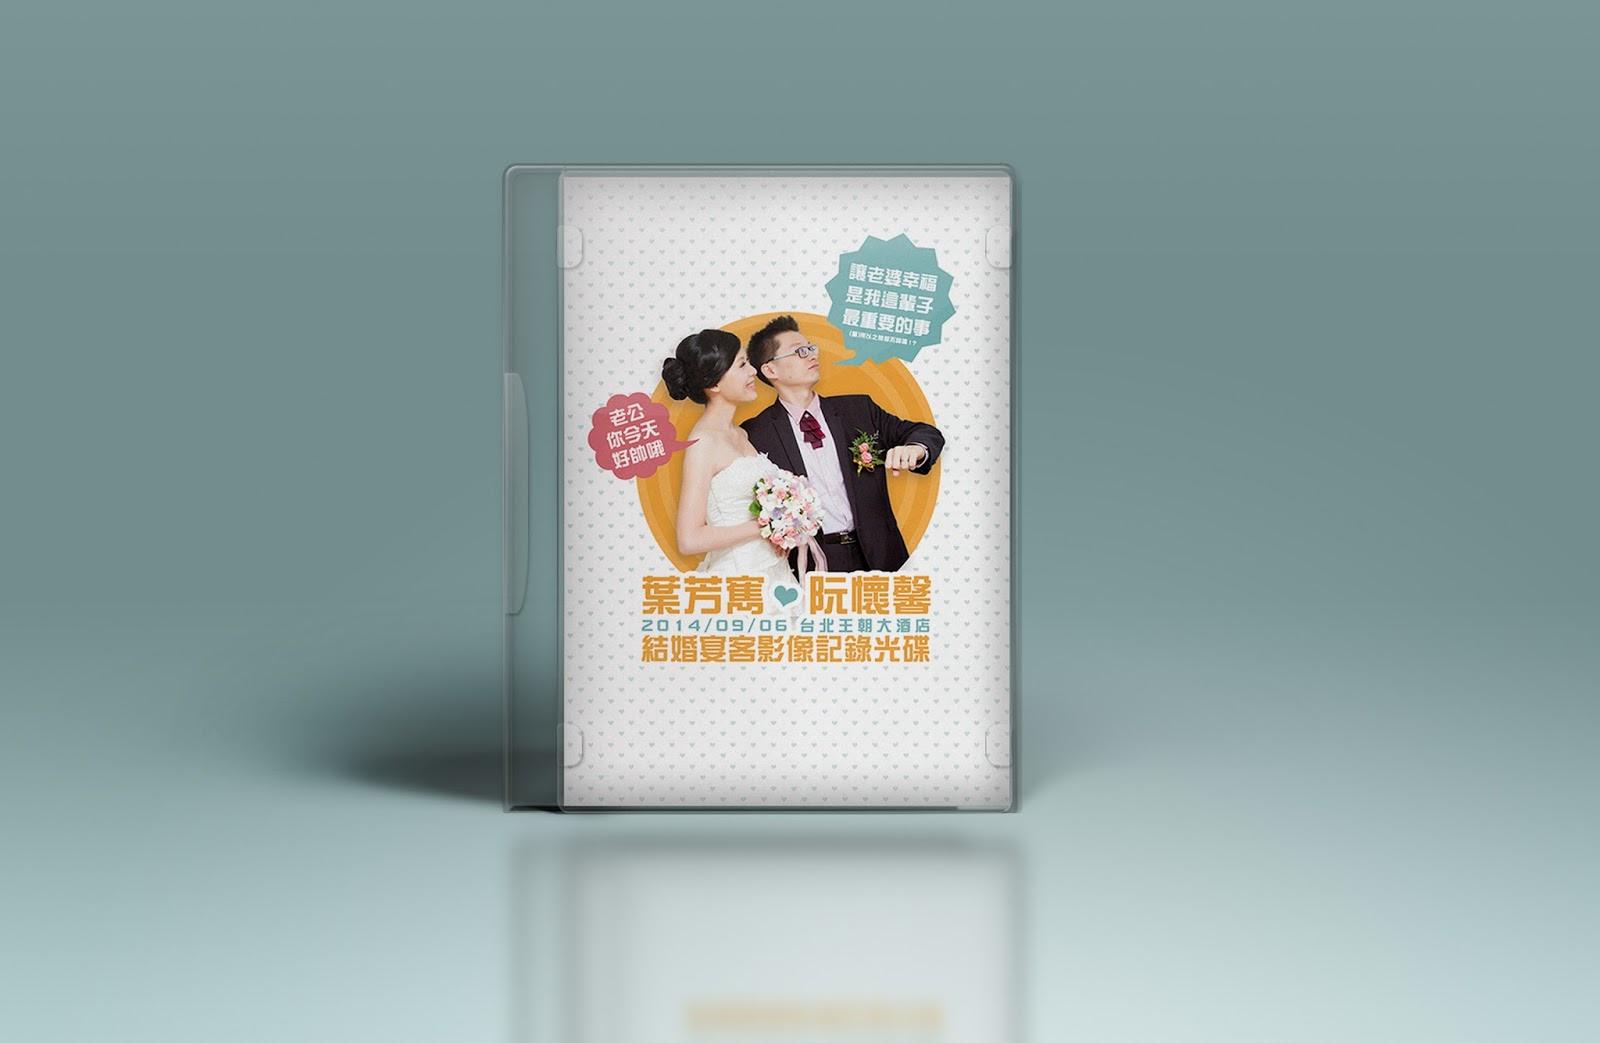 SHOWCASE作品展示 | 芳寯×懷馨婚攝DVD封面設計 by MUMULab.com